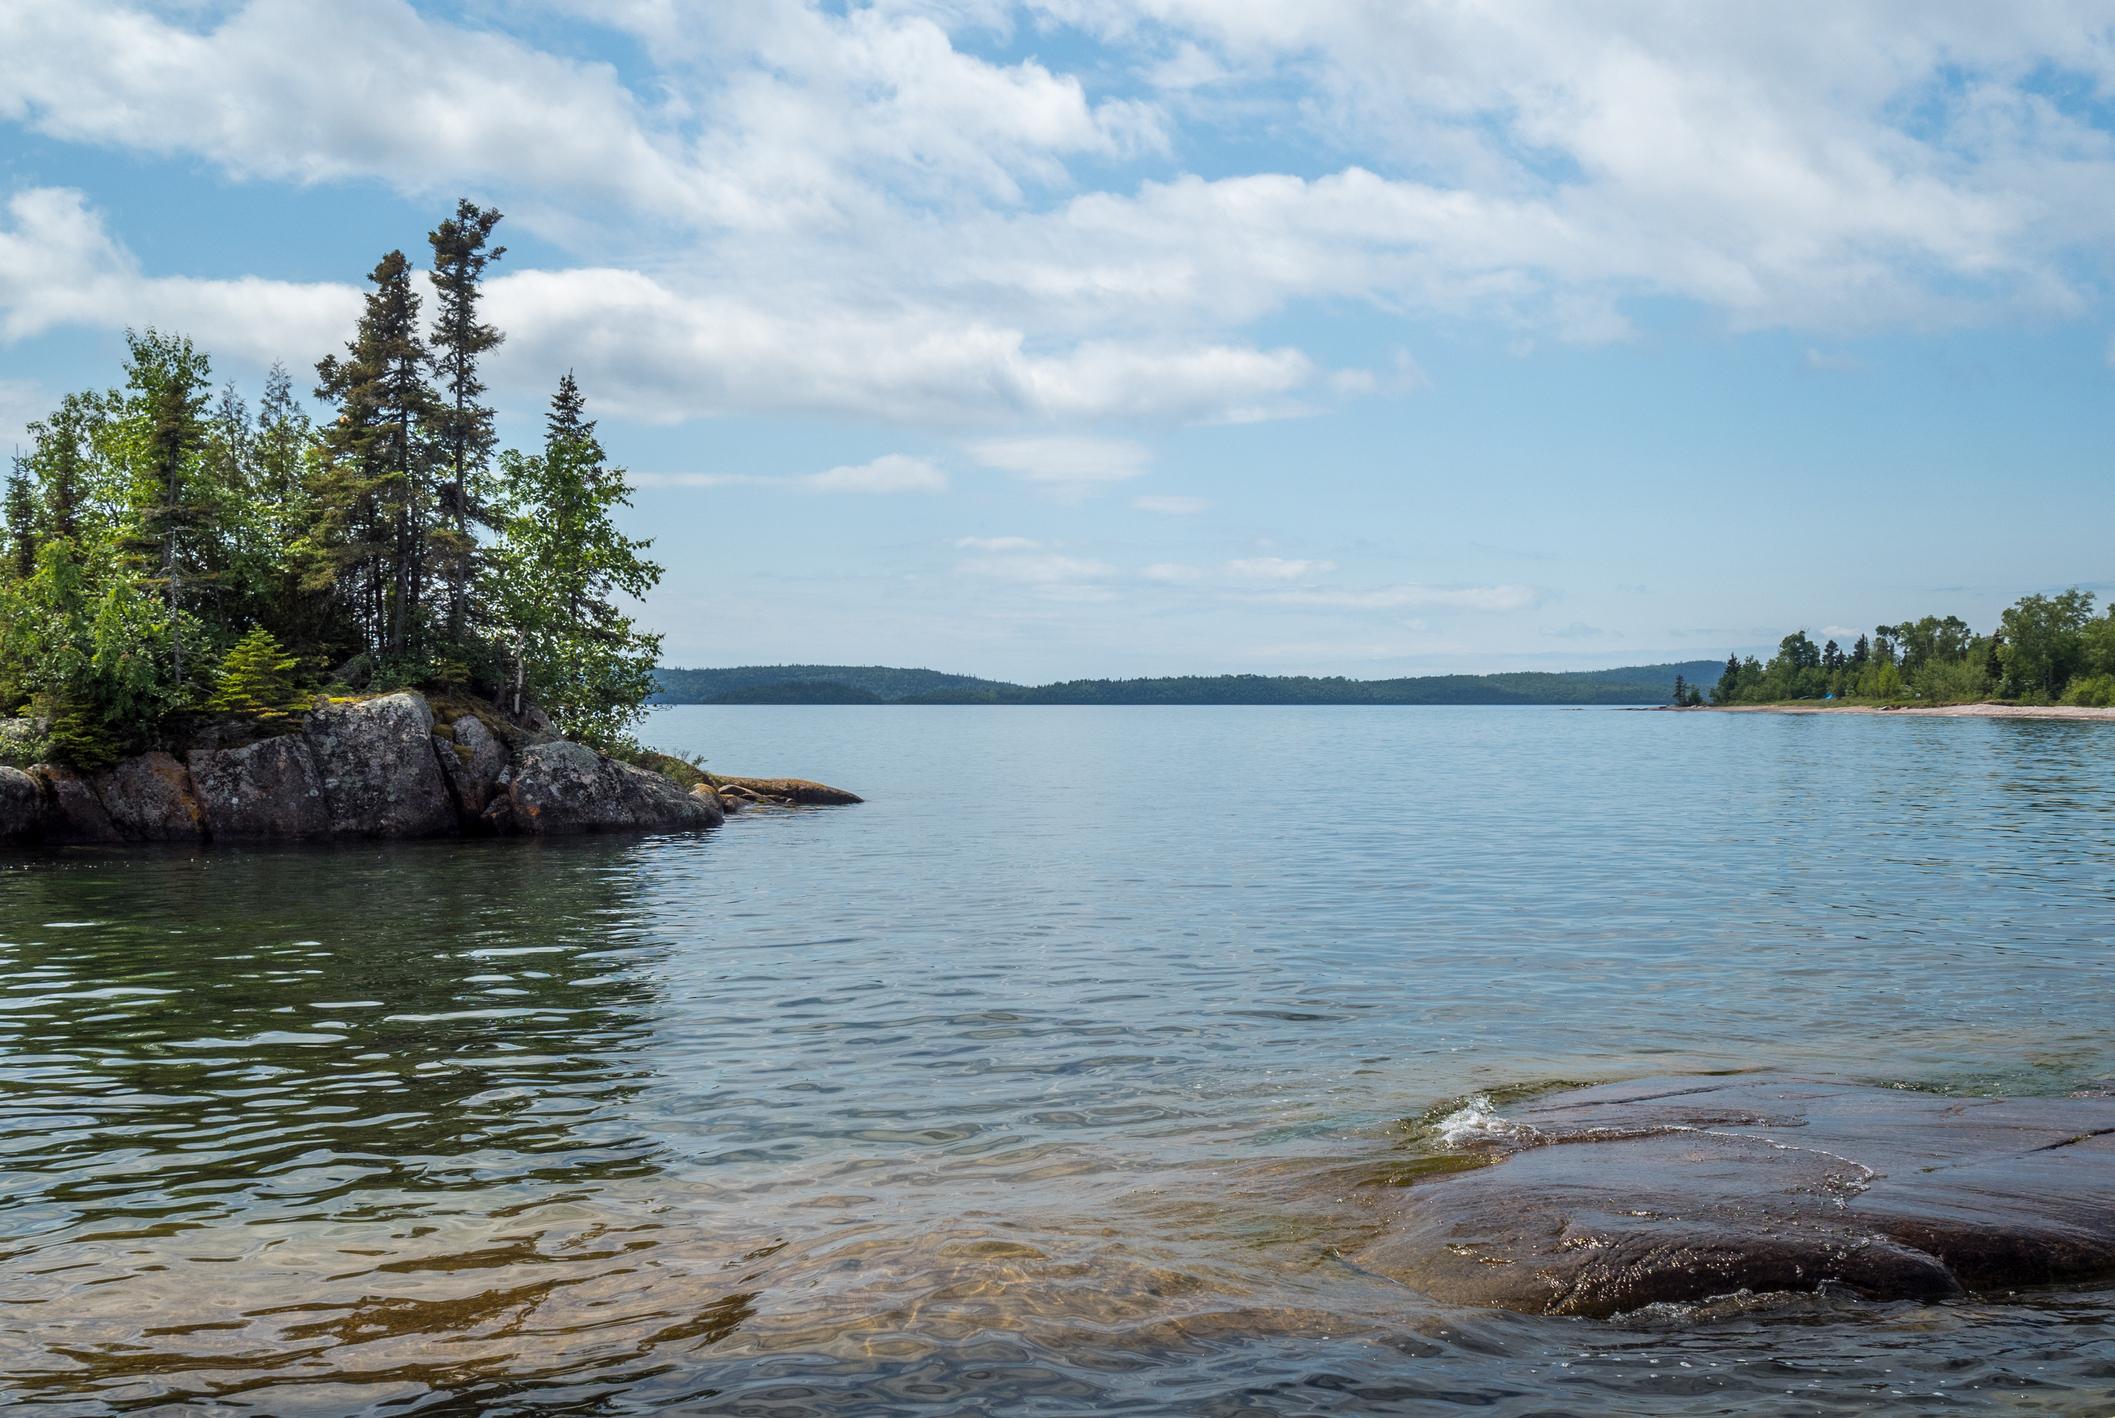 Canada Rugged Rocky North Shore in Canada